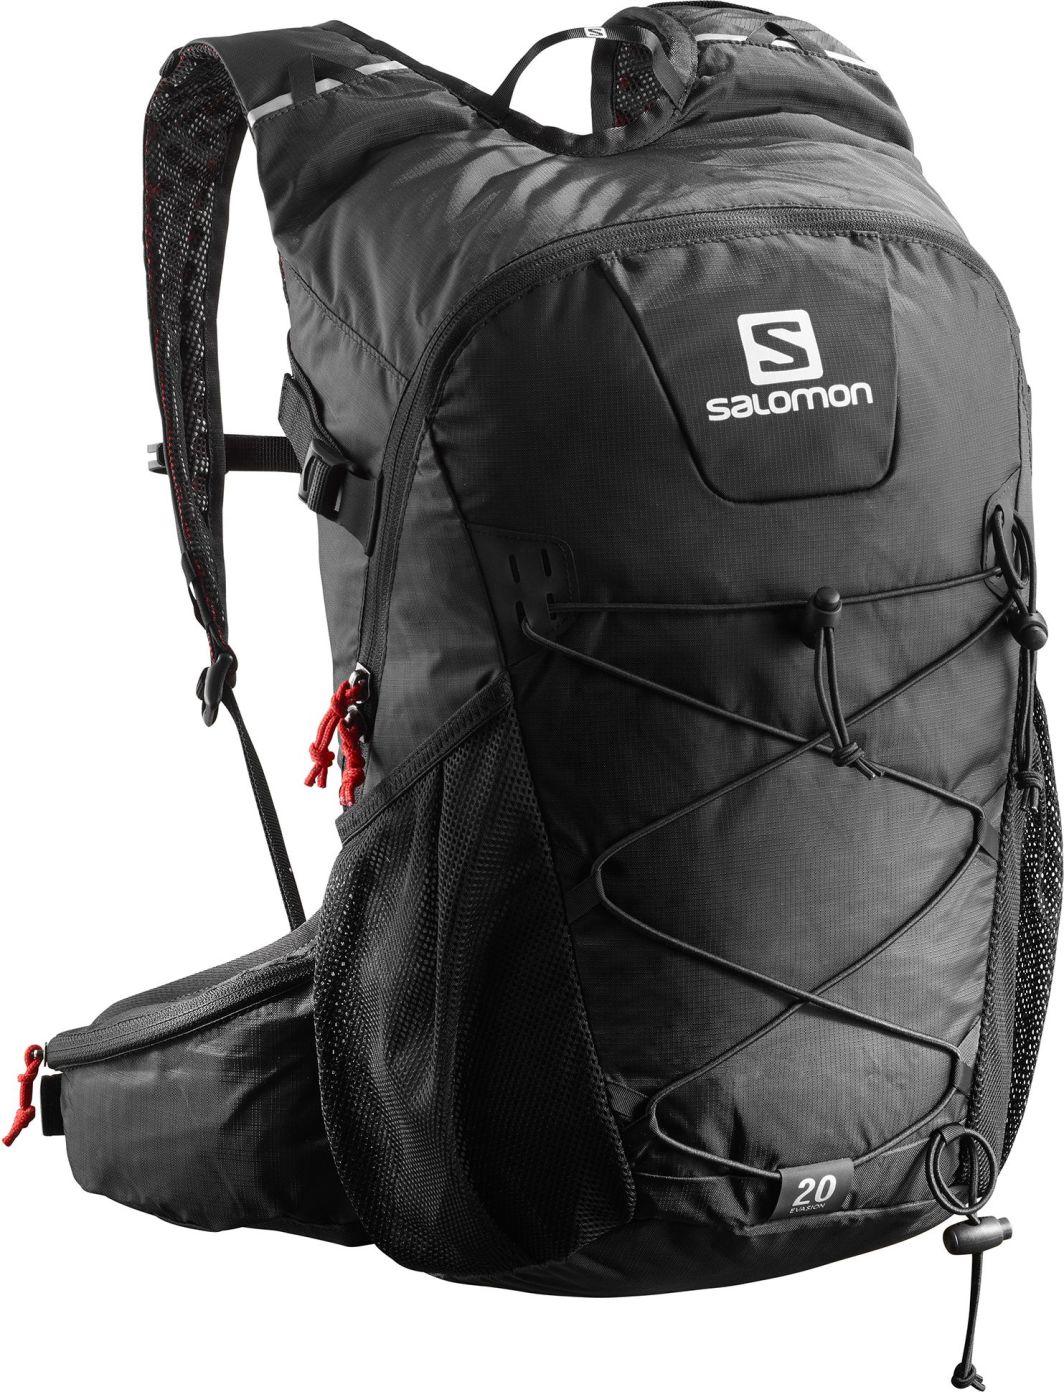 Sklep: plecak trekkingowy evasion 20 salomon black